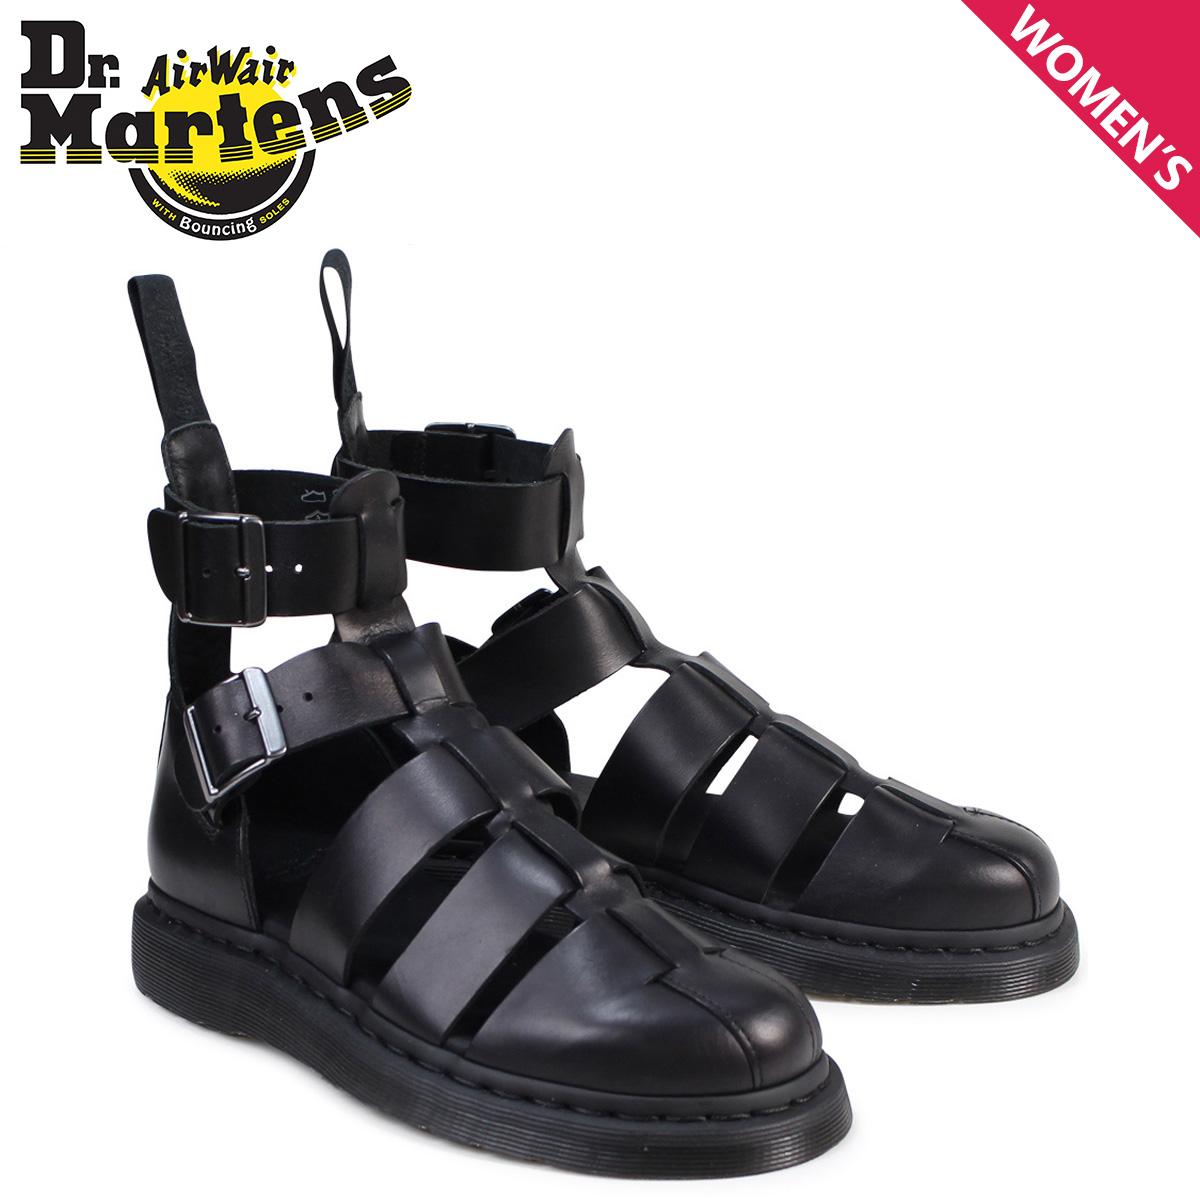 Black sandals gap - Doctor Martin Sandals Men Gap Dis Dr Martens Geraldo Strap Sandals R15696001 Black The